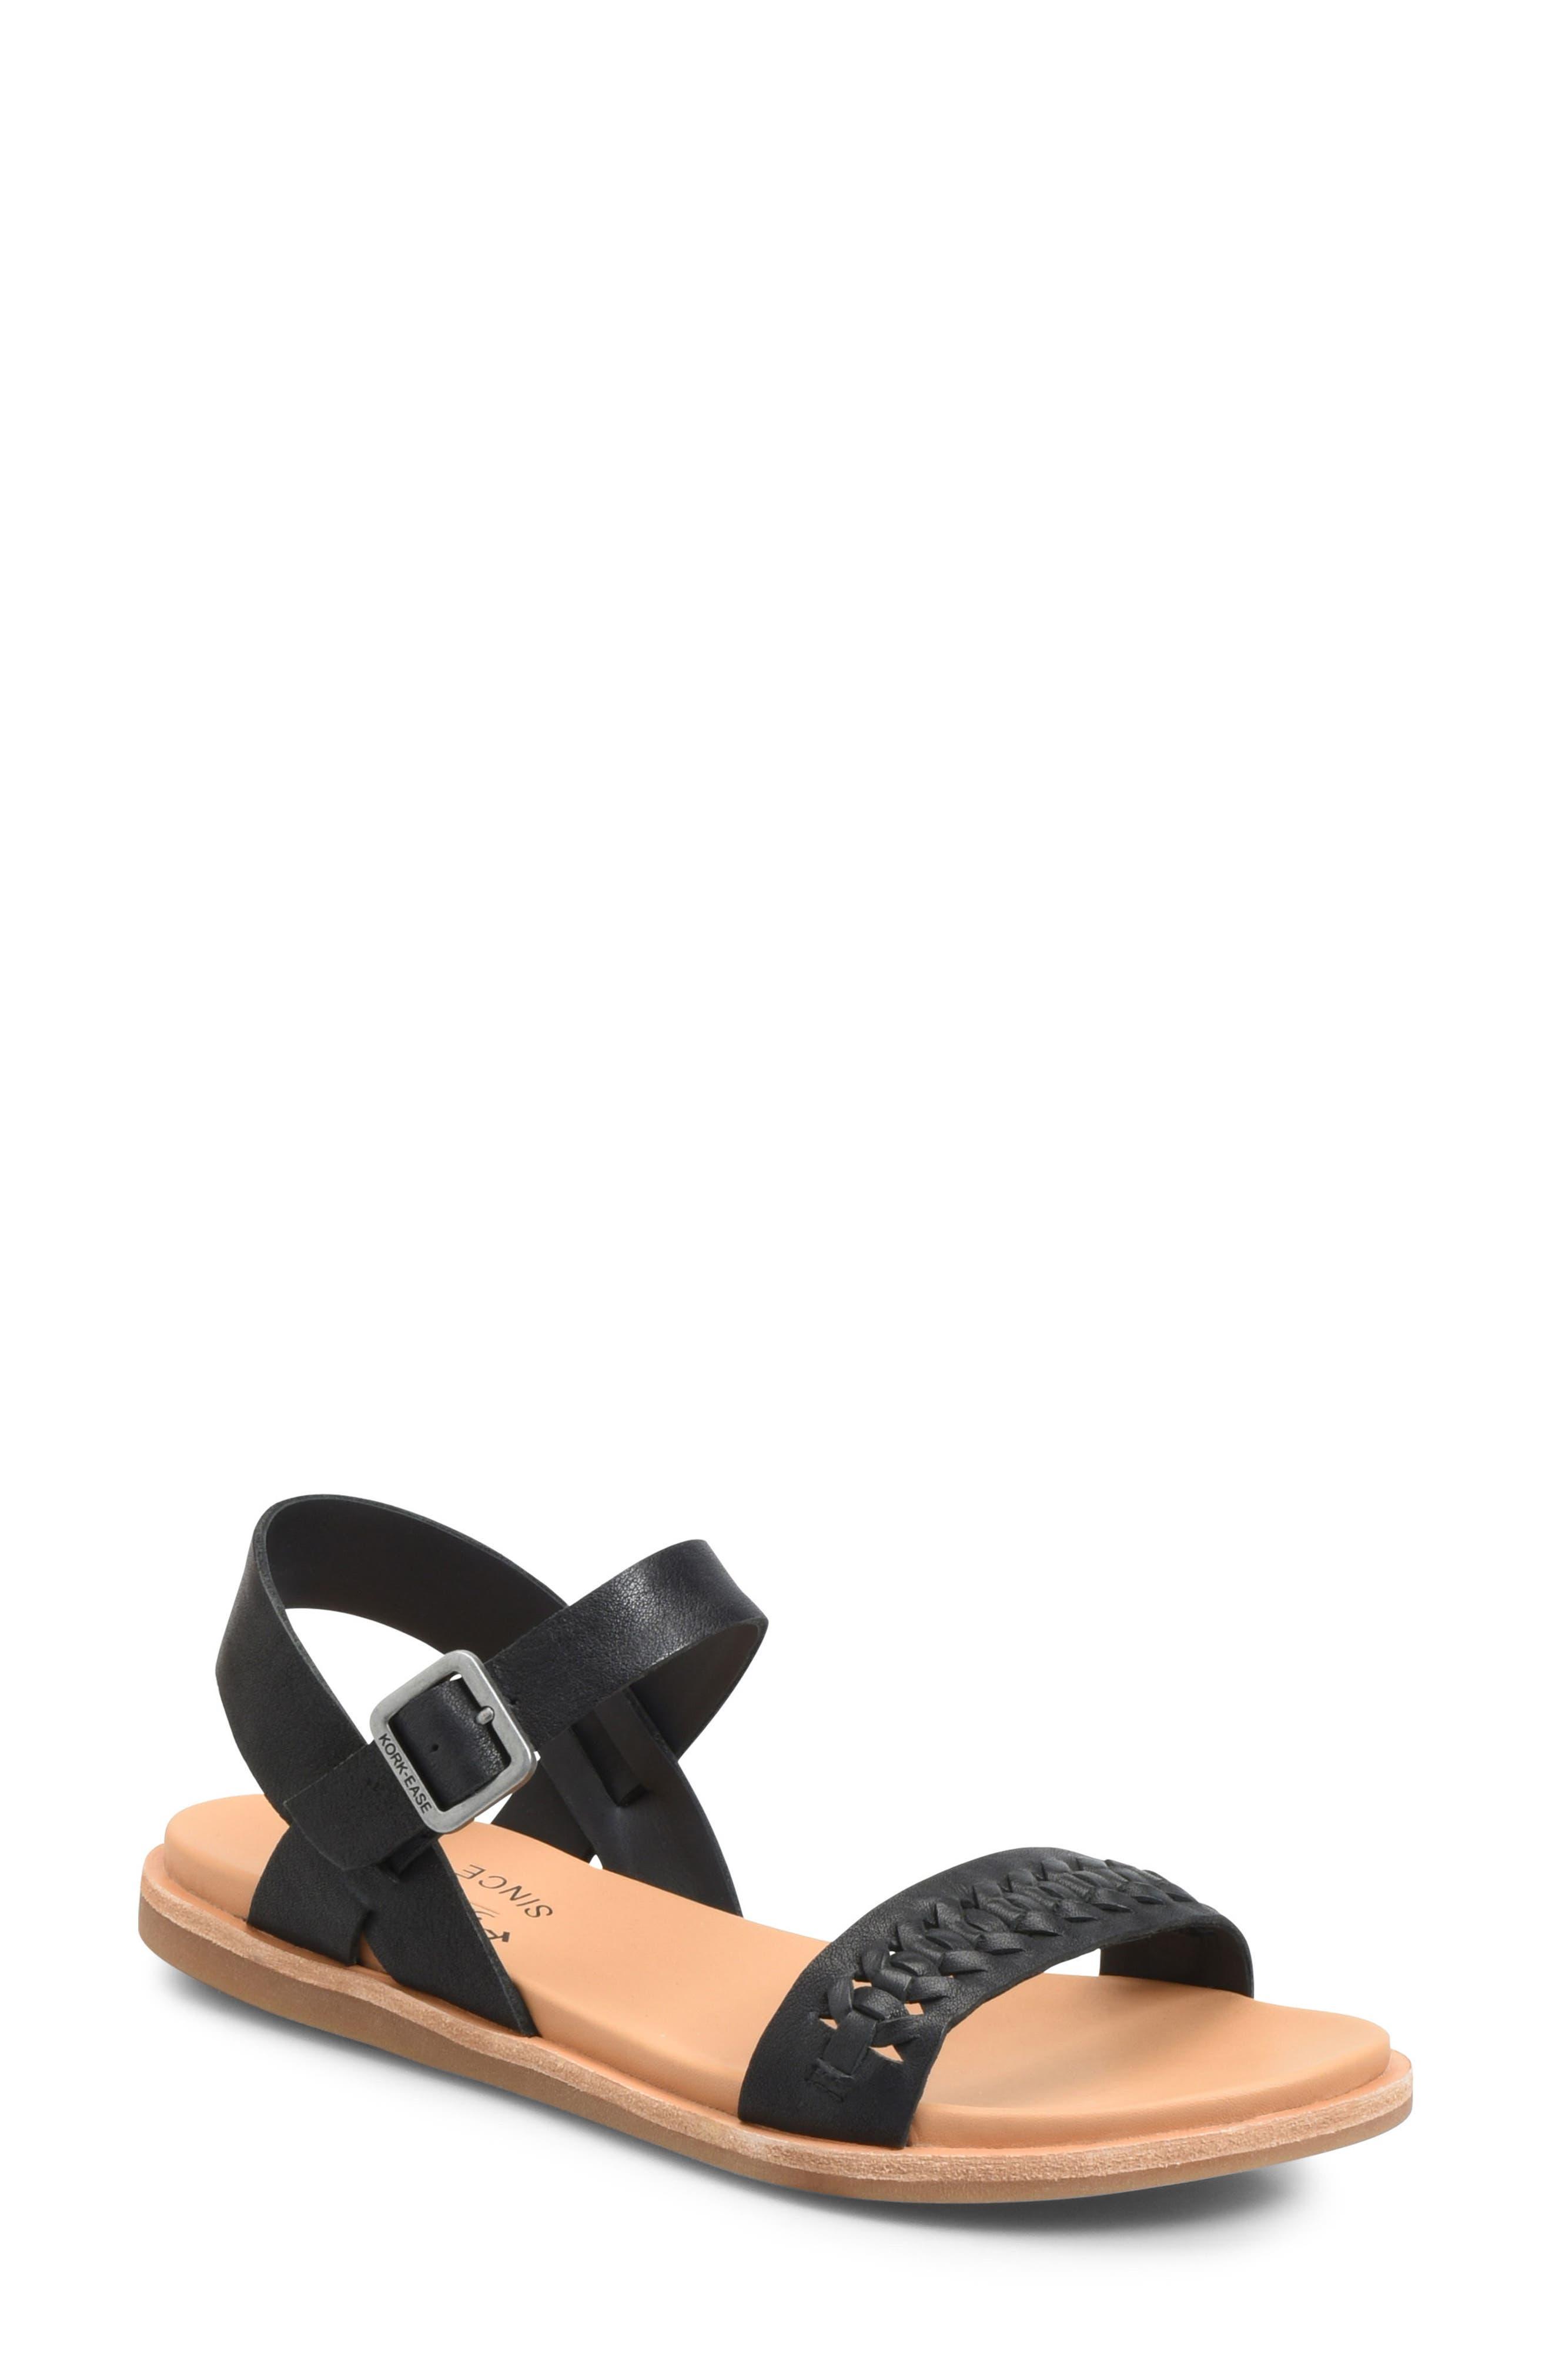 Yucca Braid Sandal, Main, color, BLACK LEATHER